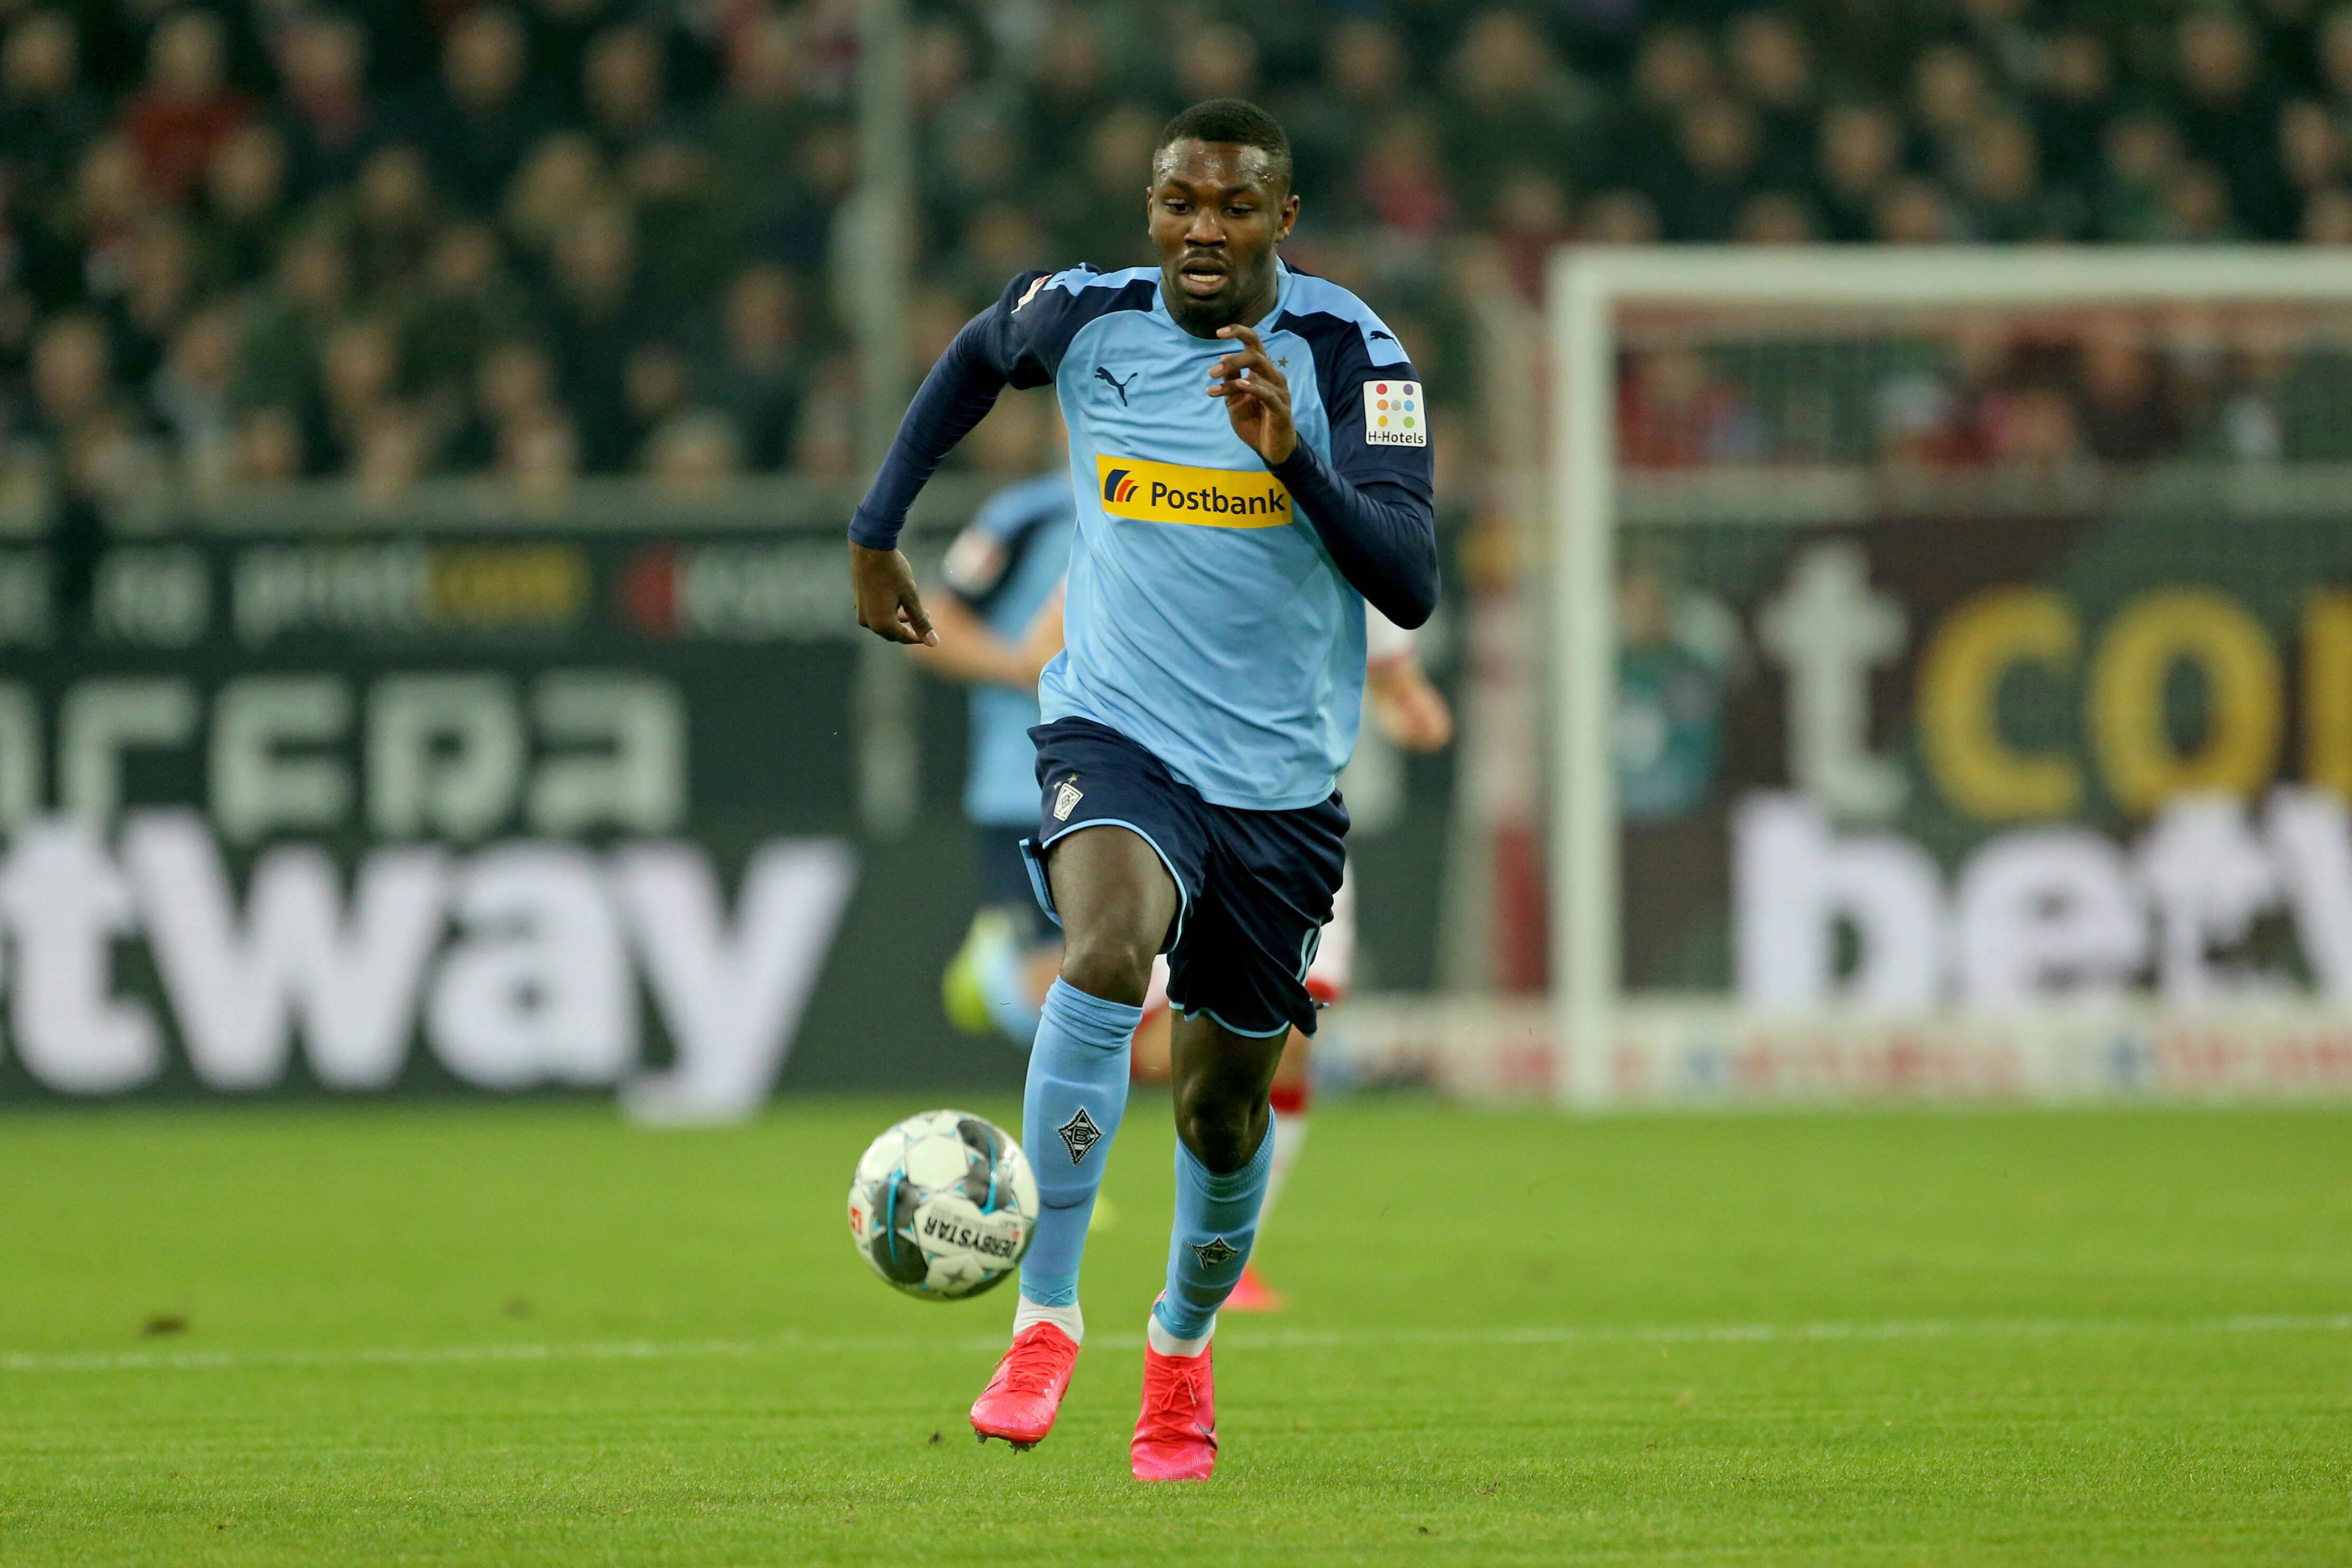 Football - Etranger - Bundesliga : Mönchengladbach-Union Berlin en direct